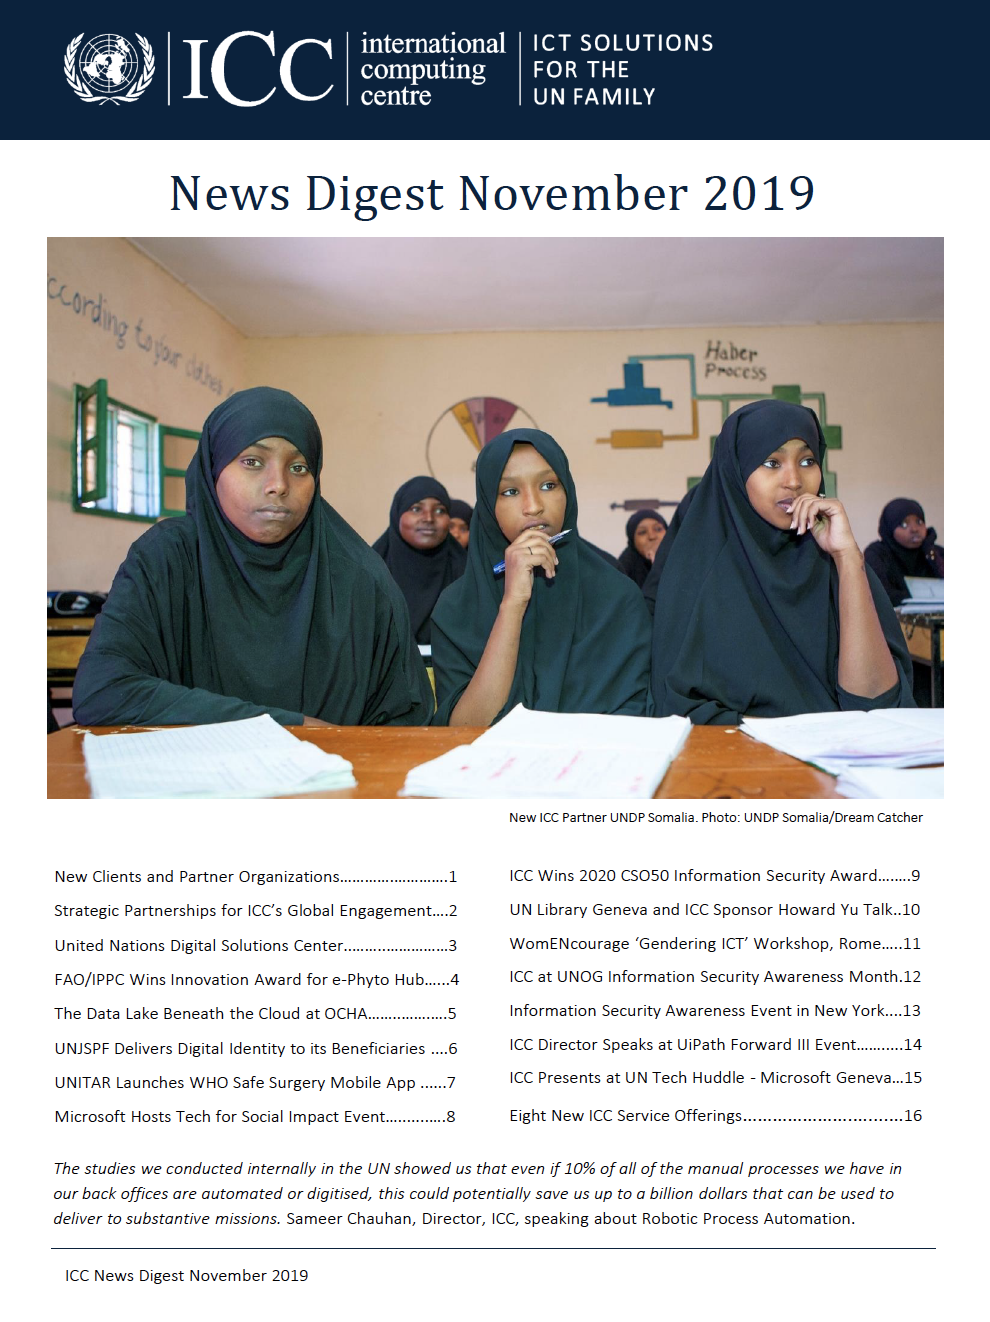 UNICC News Digest November 2019